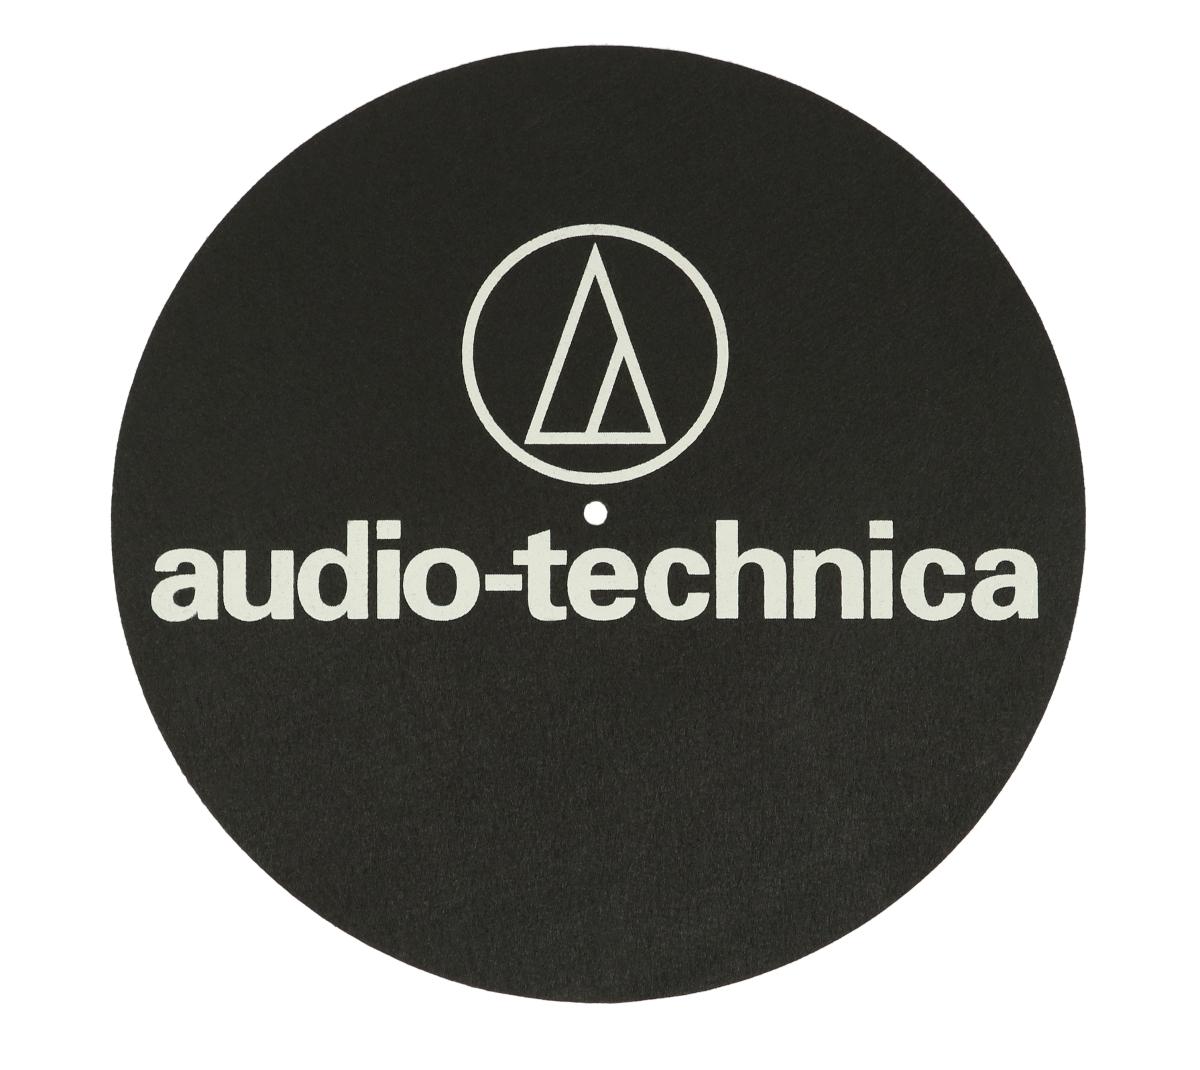 Audio-Technica 612-U3560A-052  Slipmat for AT-LP1240-USB 612-U3560A-052